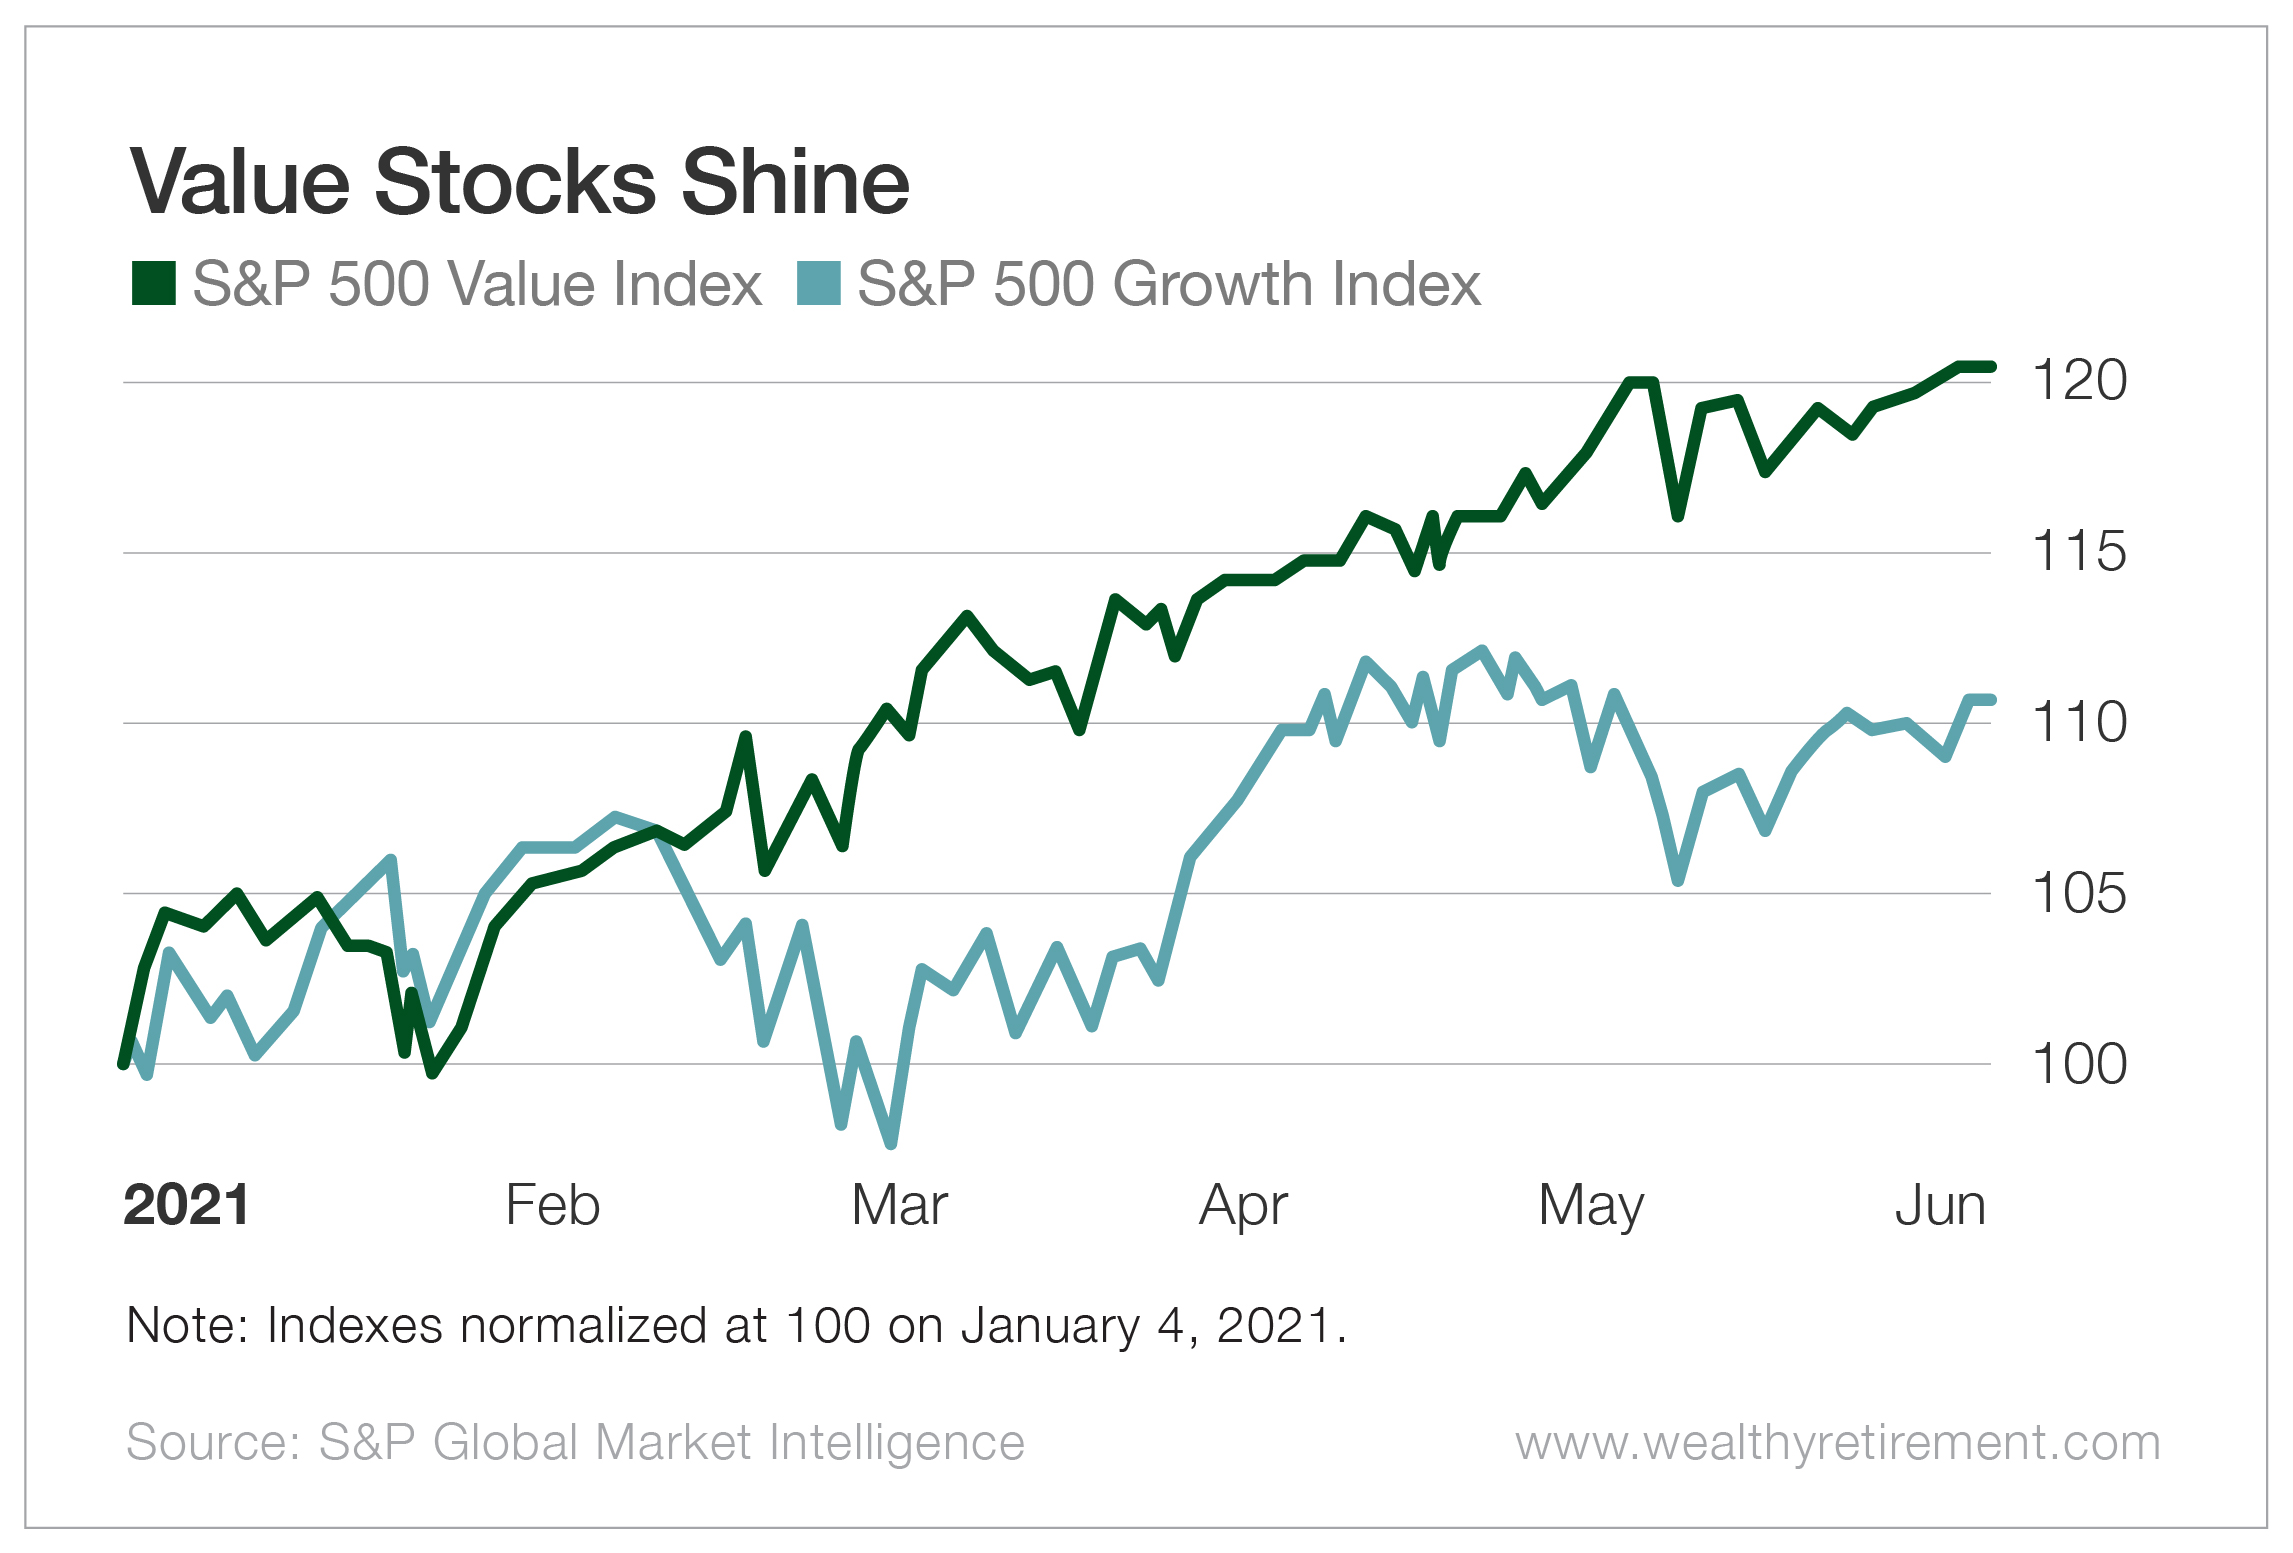 Value Stocks Shine